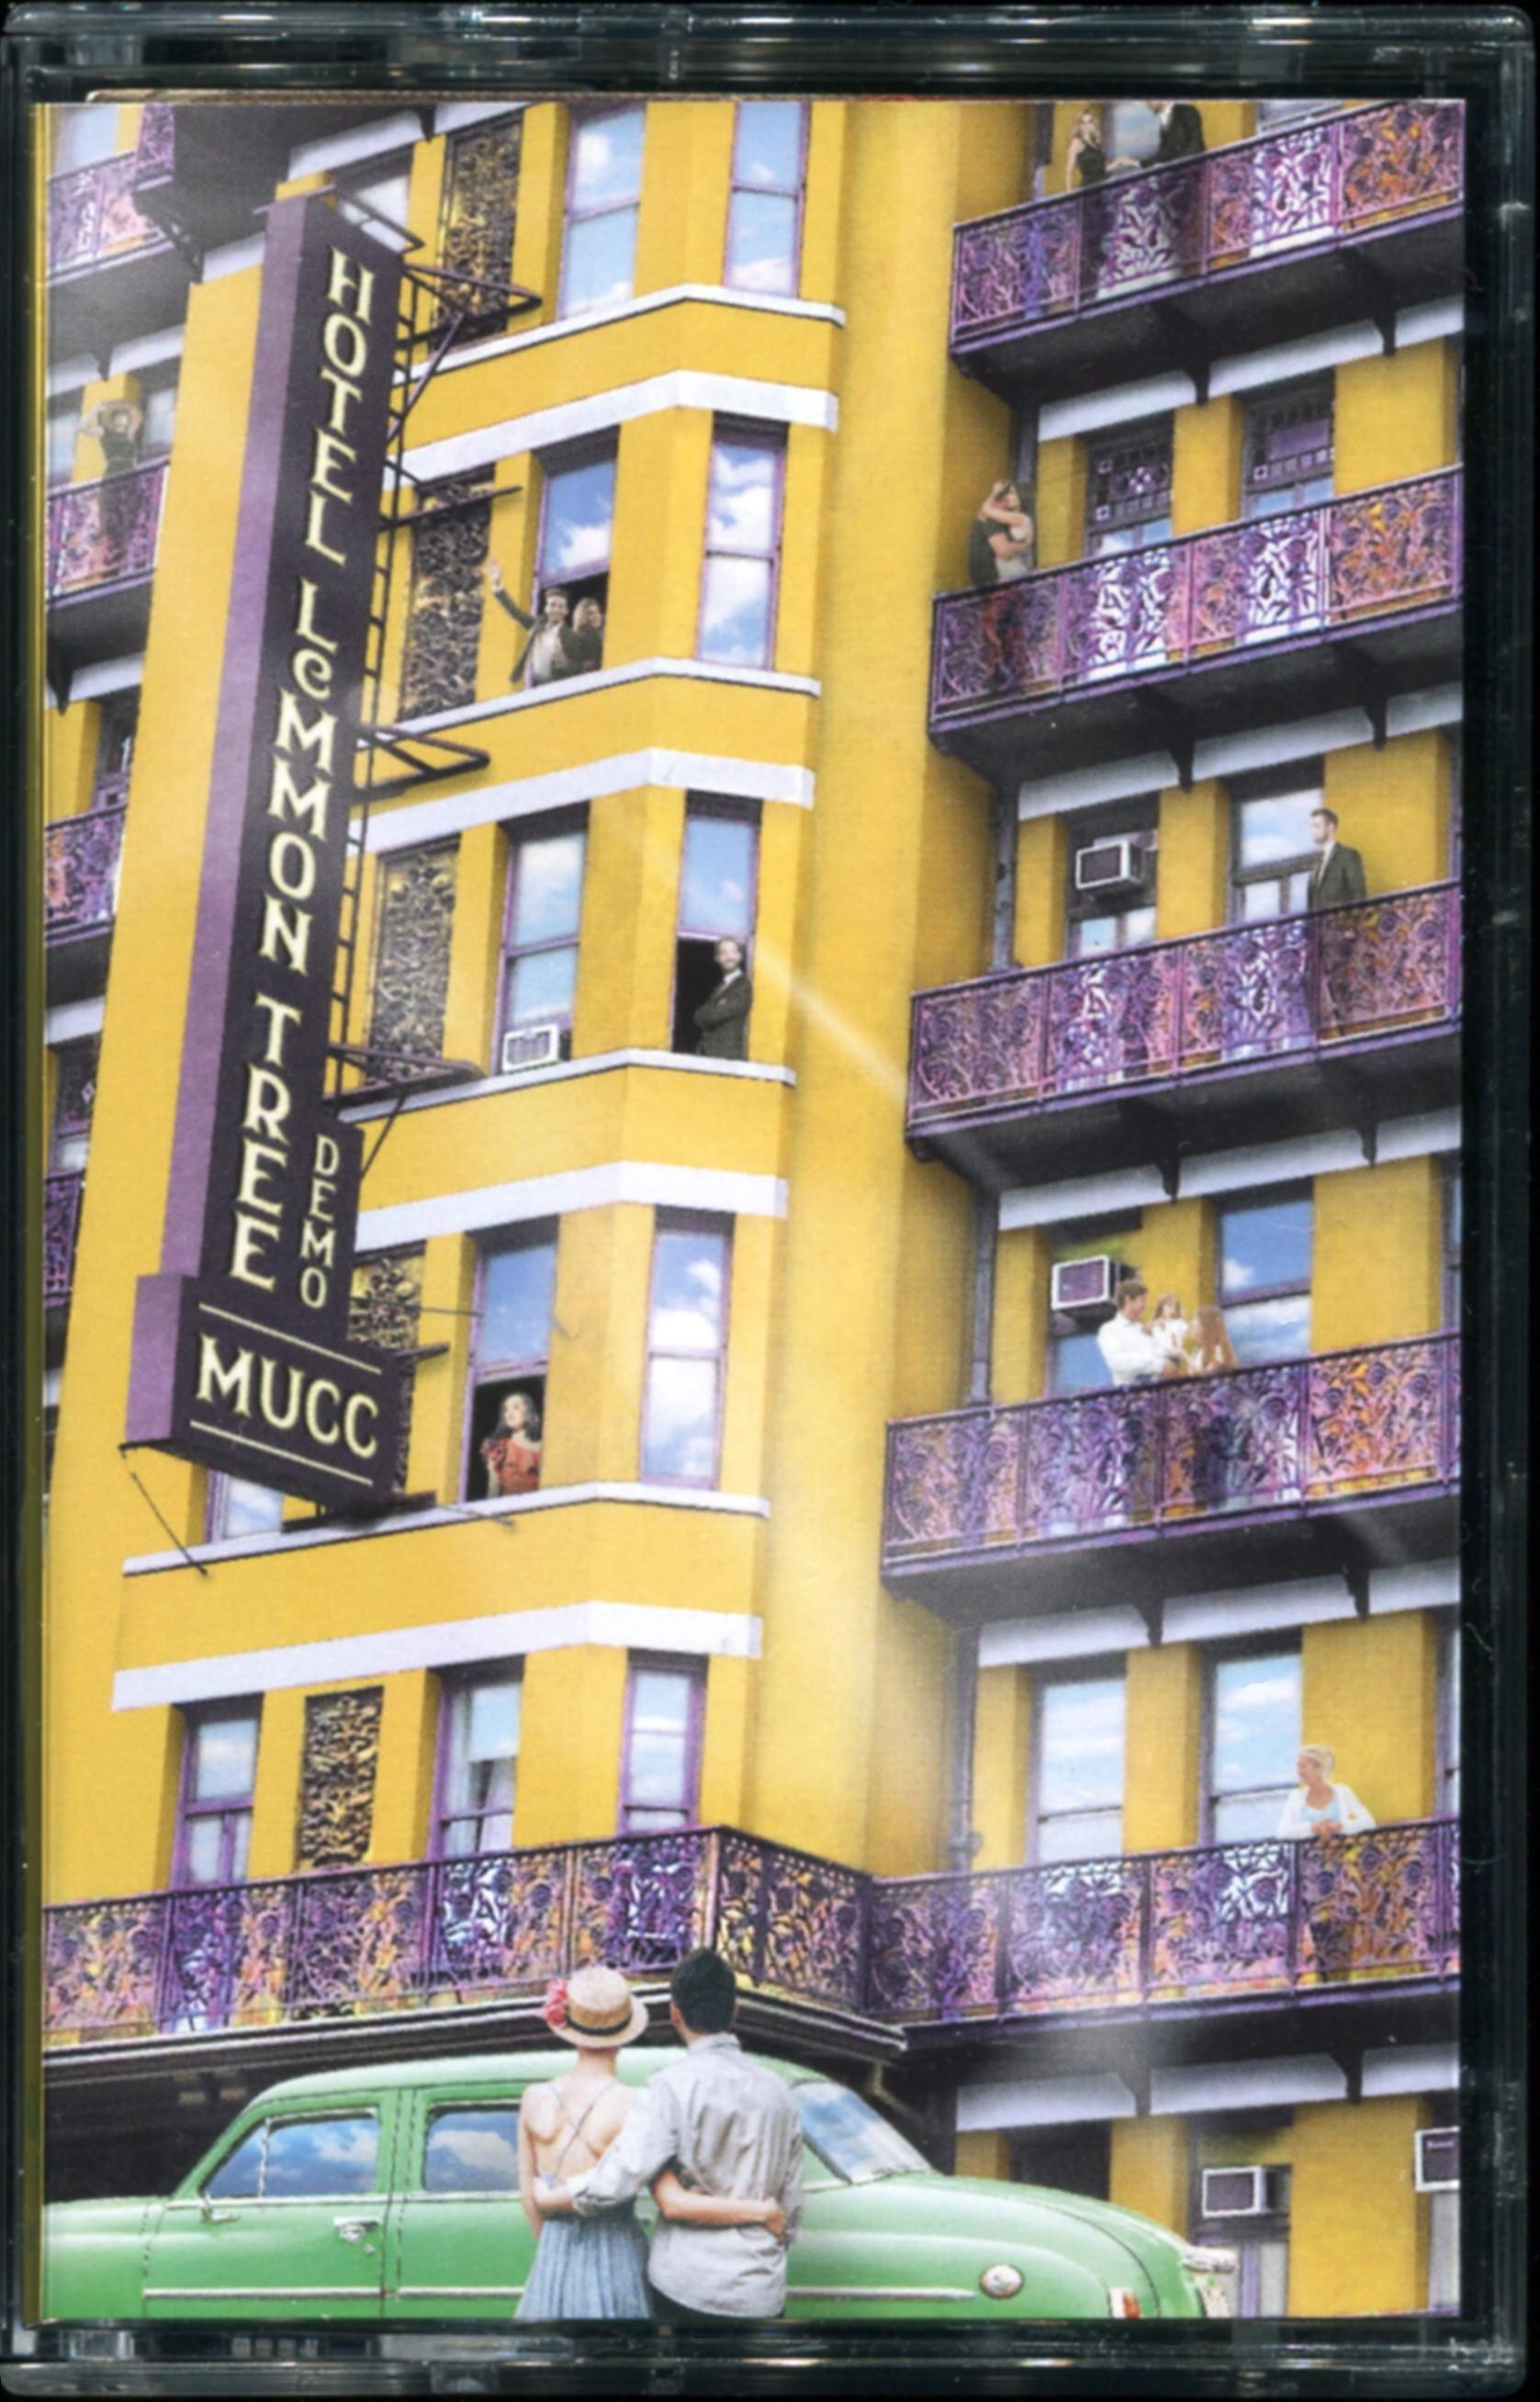 MUCC (ムック) – HOTEL LeMMON TREE DEMO [FLAC + MP3 320 / Cassette] [2019.07.01]